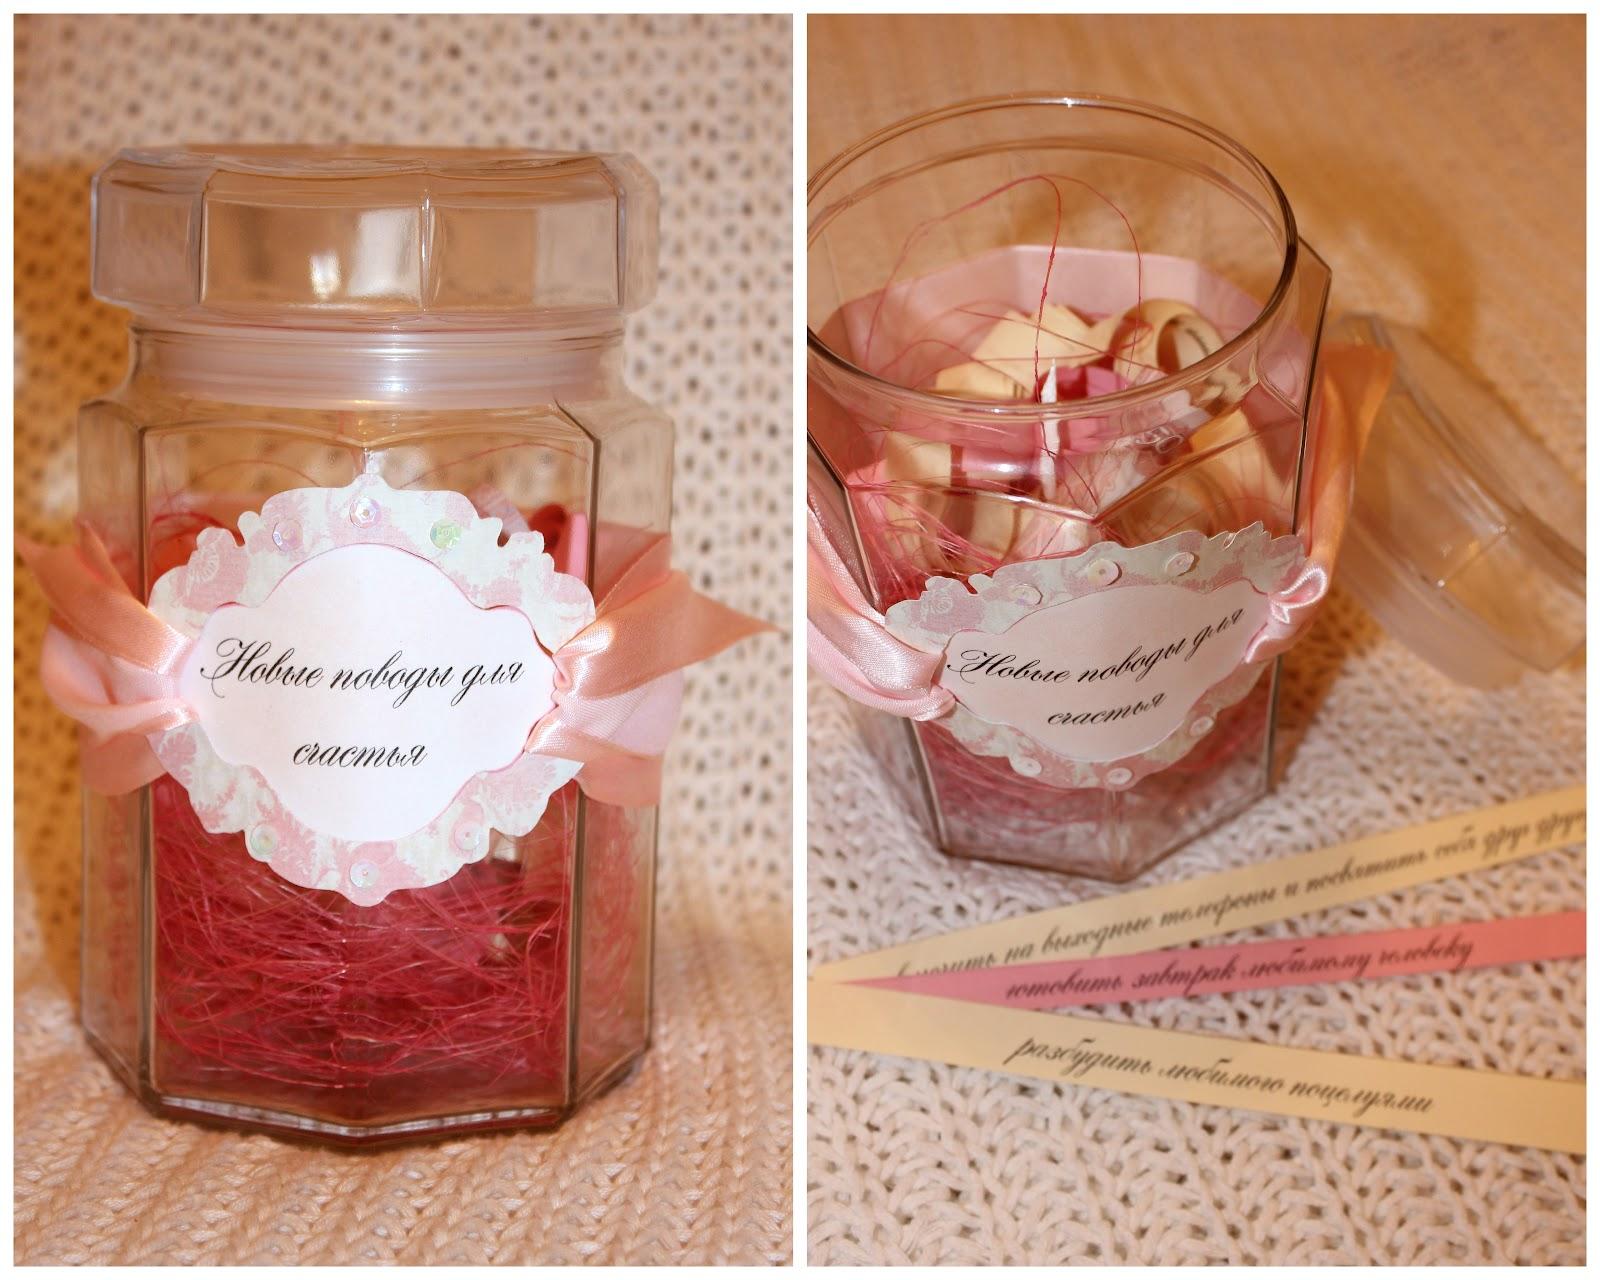 Подарки подарок на свадьбу подарки свадебные подарки 75